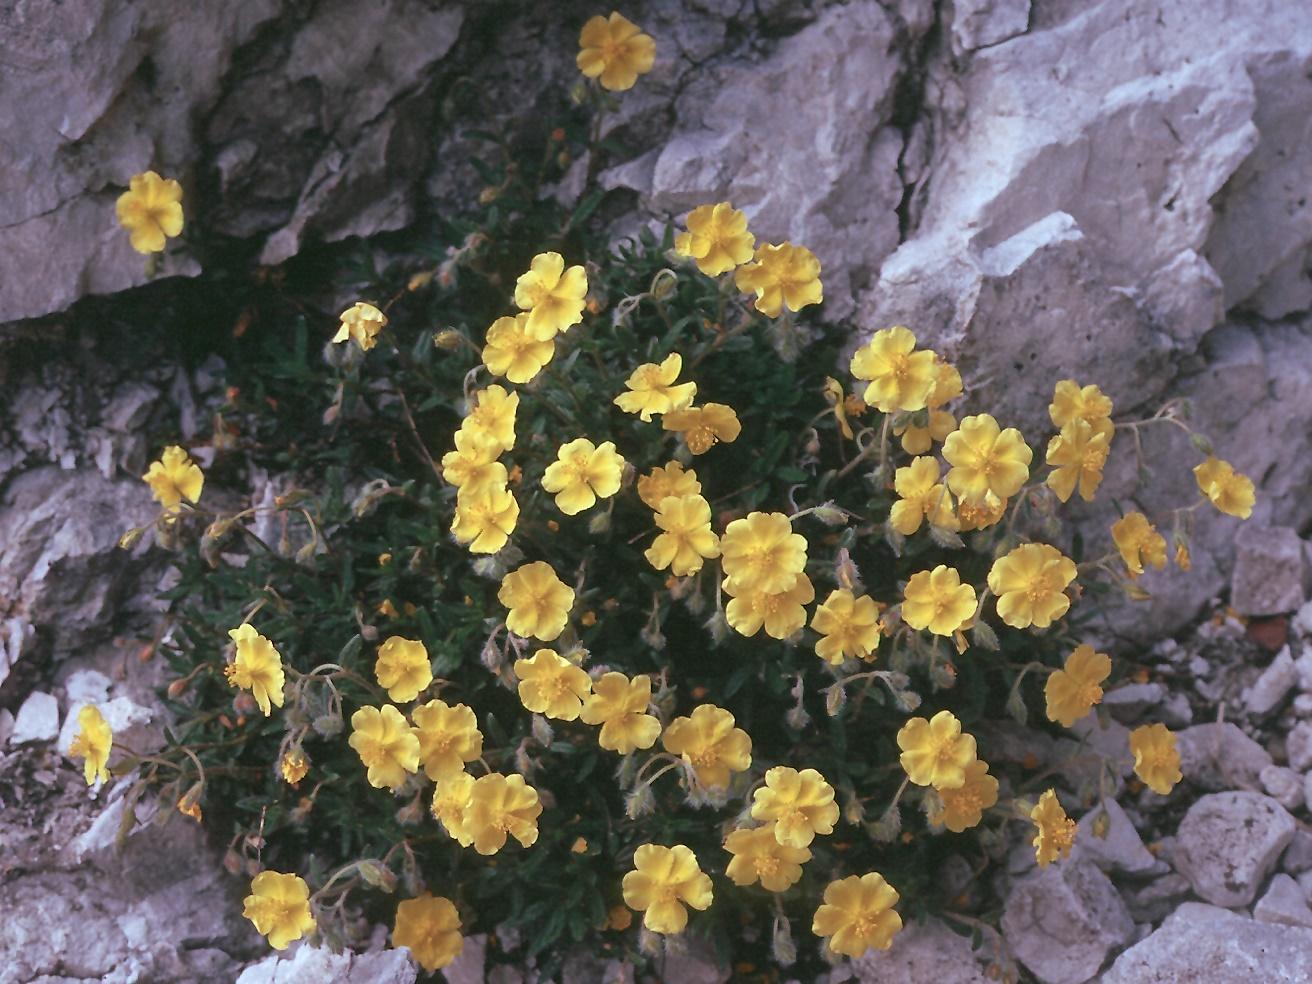 Helianthemum grandiflorum